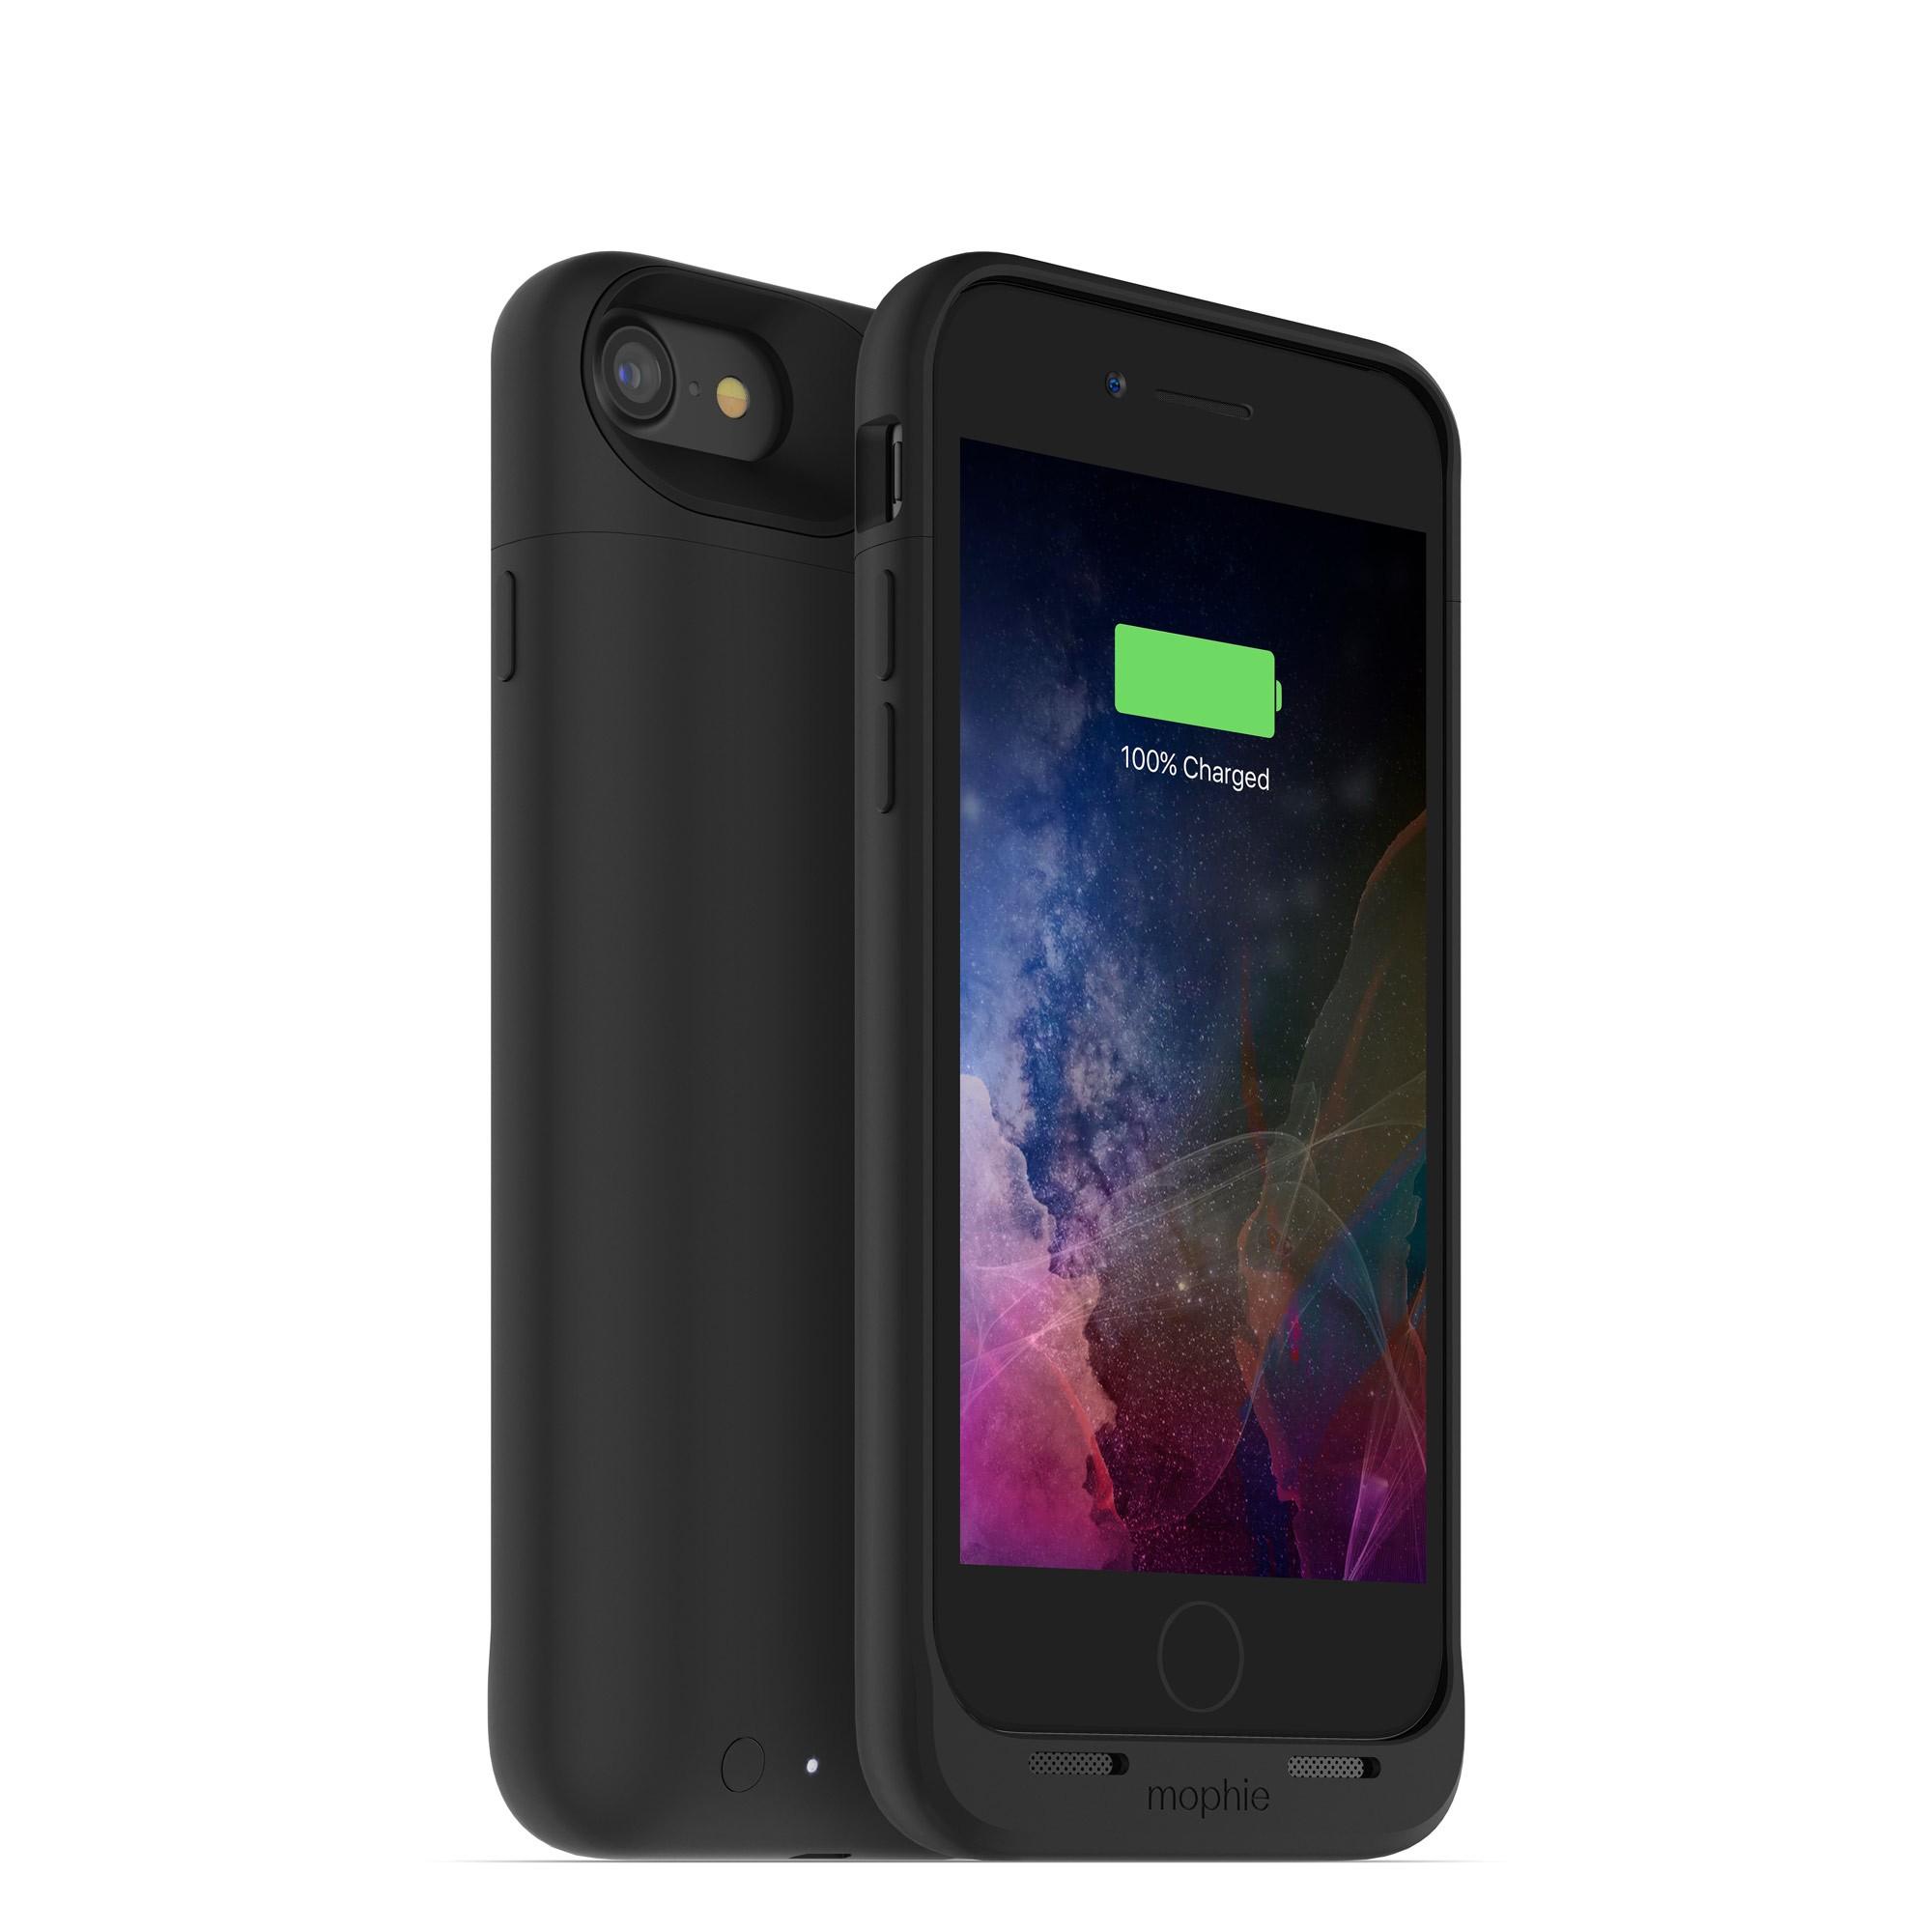 Nabíjecí pouzdro pro Apple iPhone 7 / 8 - Mophie, Juice Pack Air 2525mAh Black